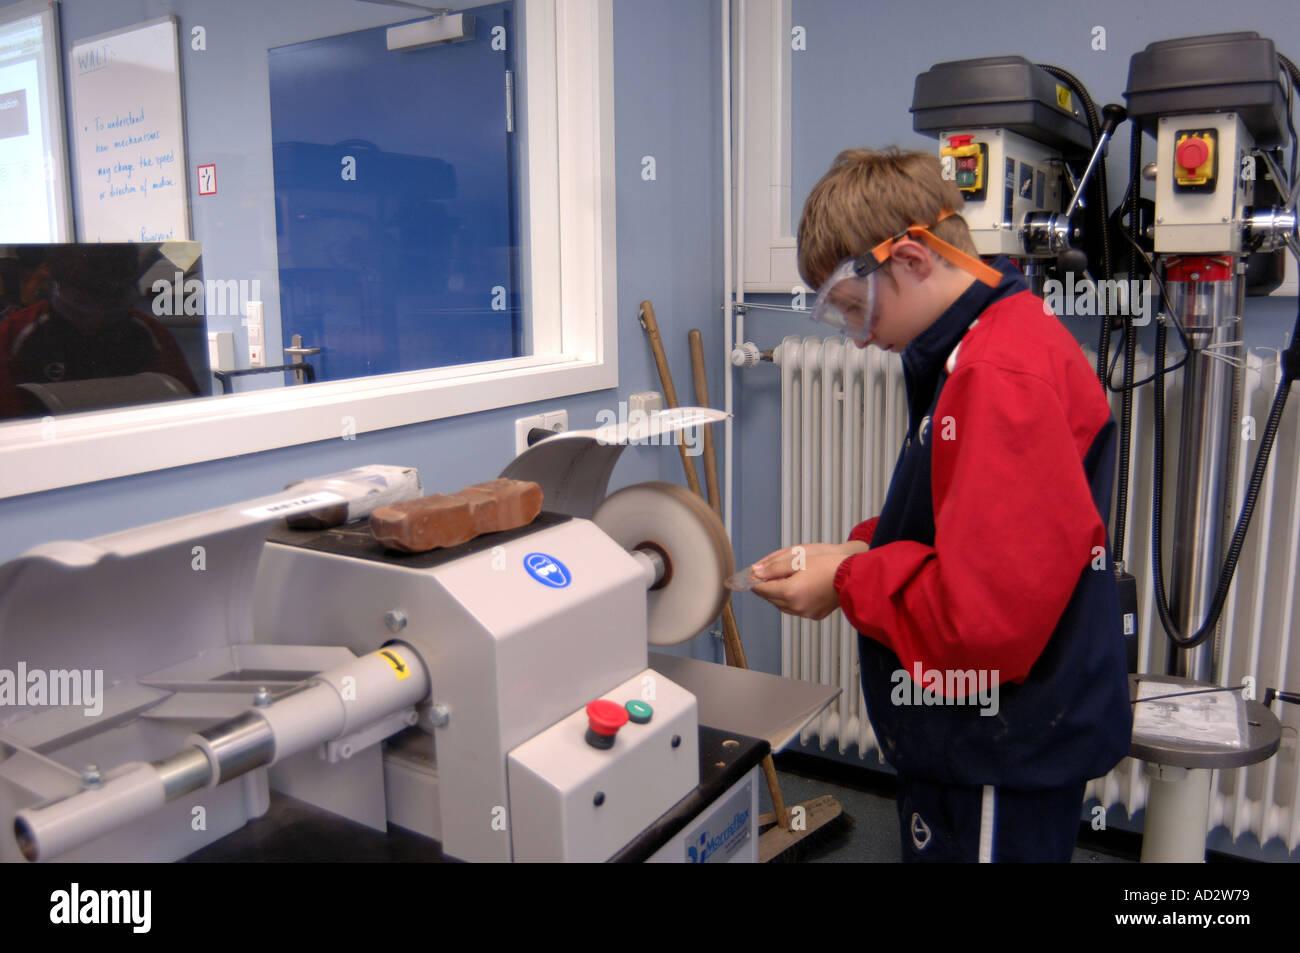 Kids Children School Education Classroom British Learn Work Study